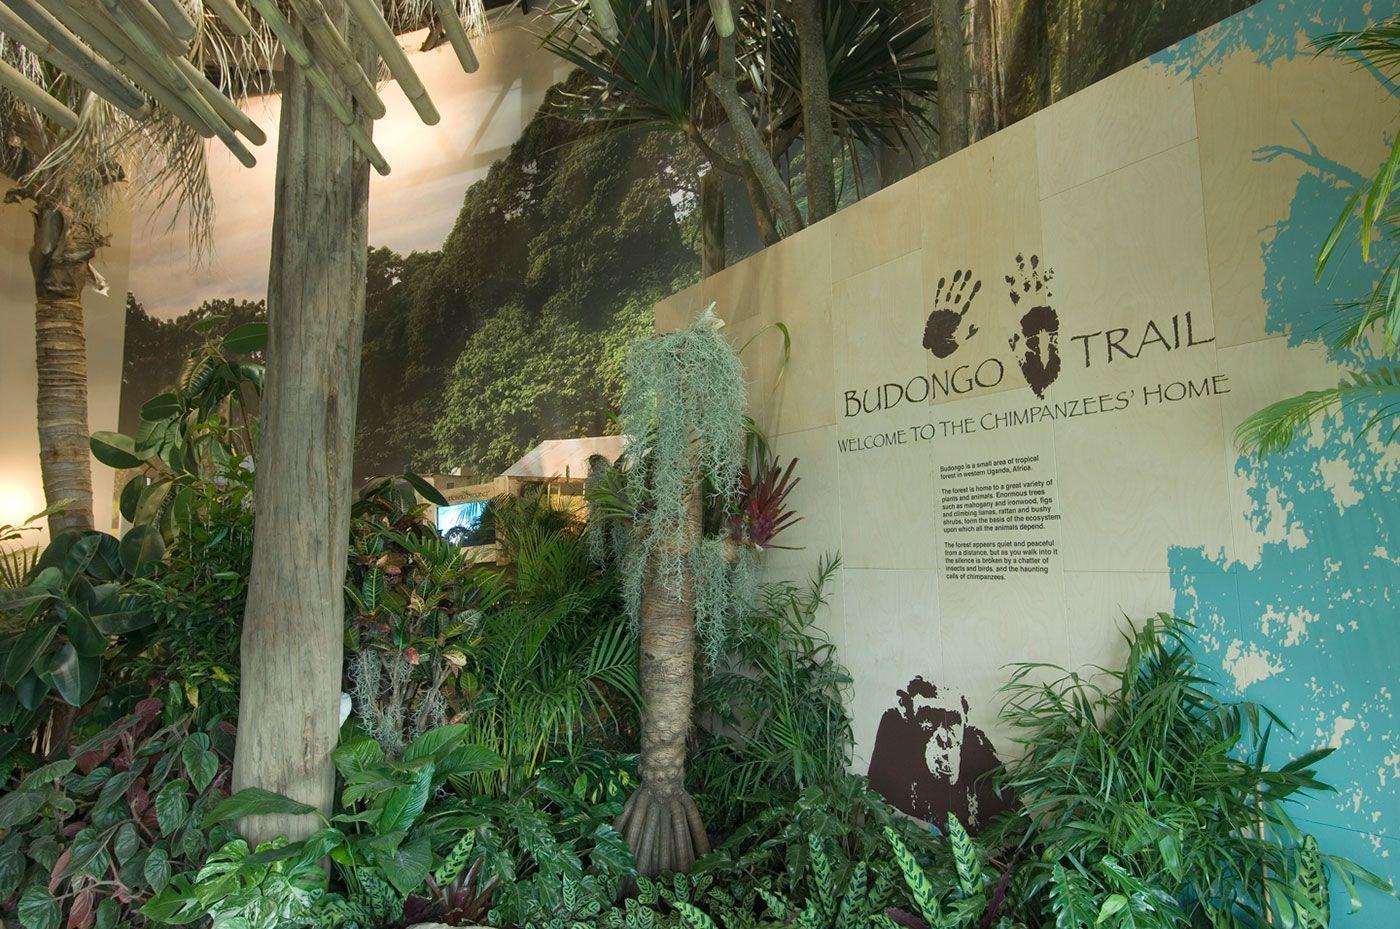 Budongo Trail at Edinburgh Zoo